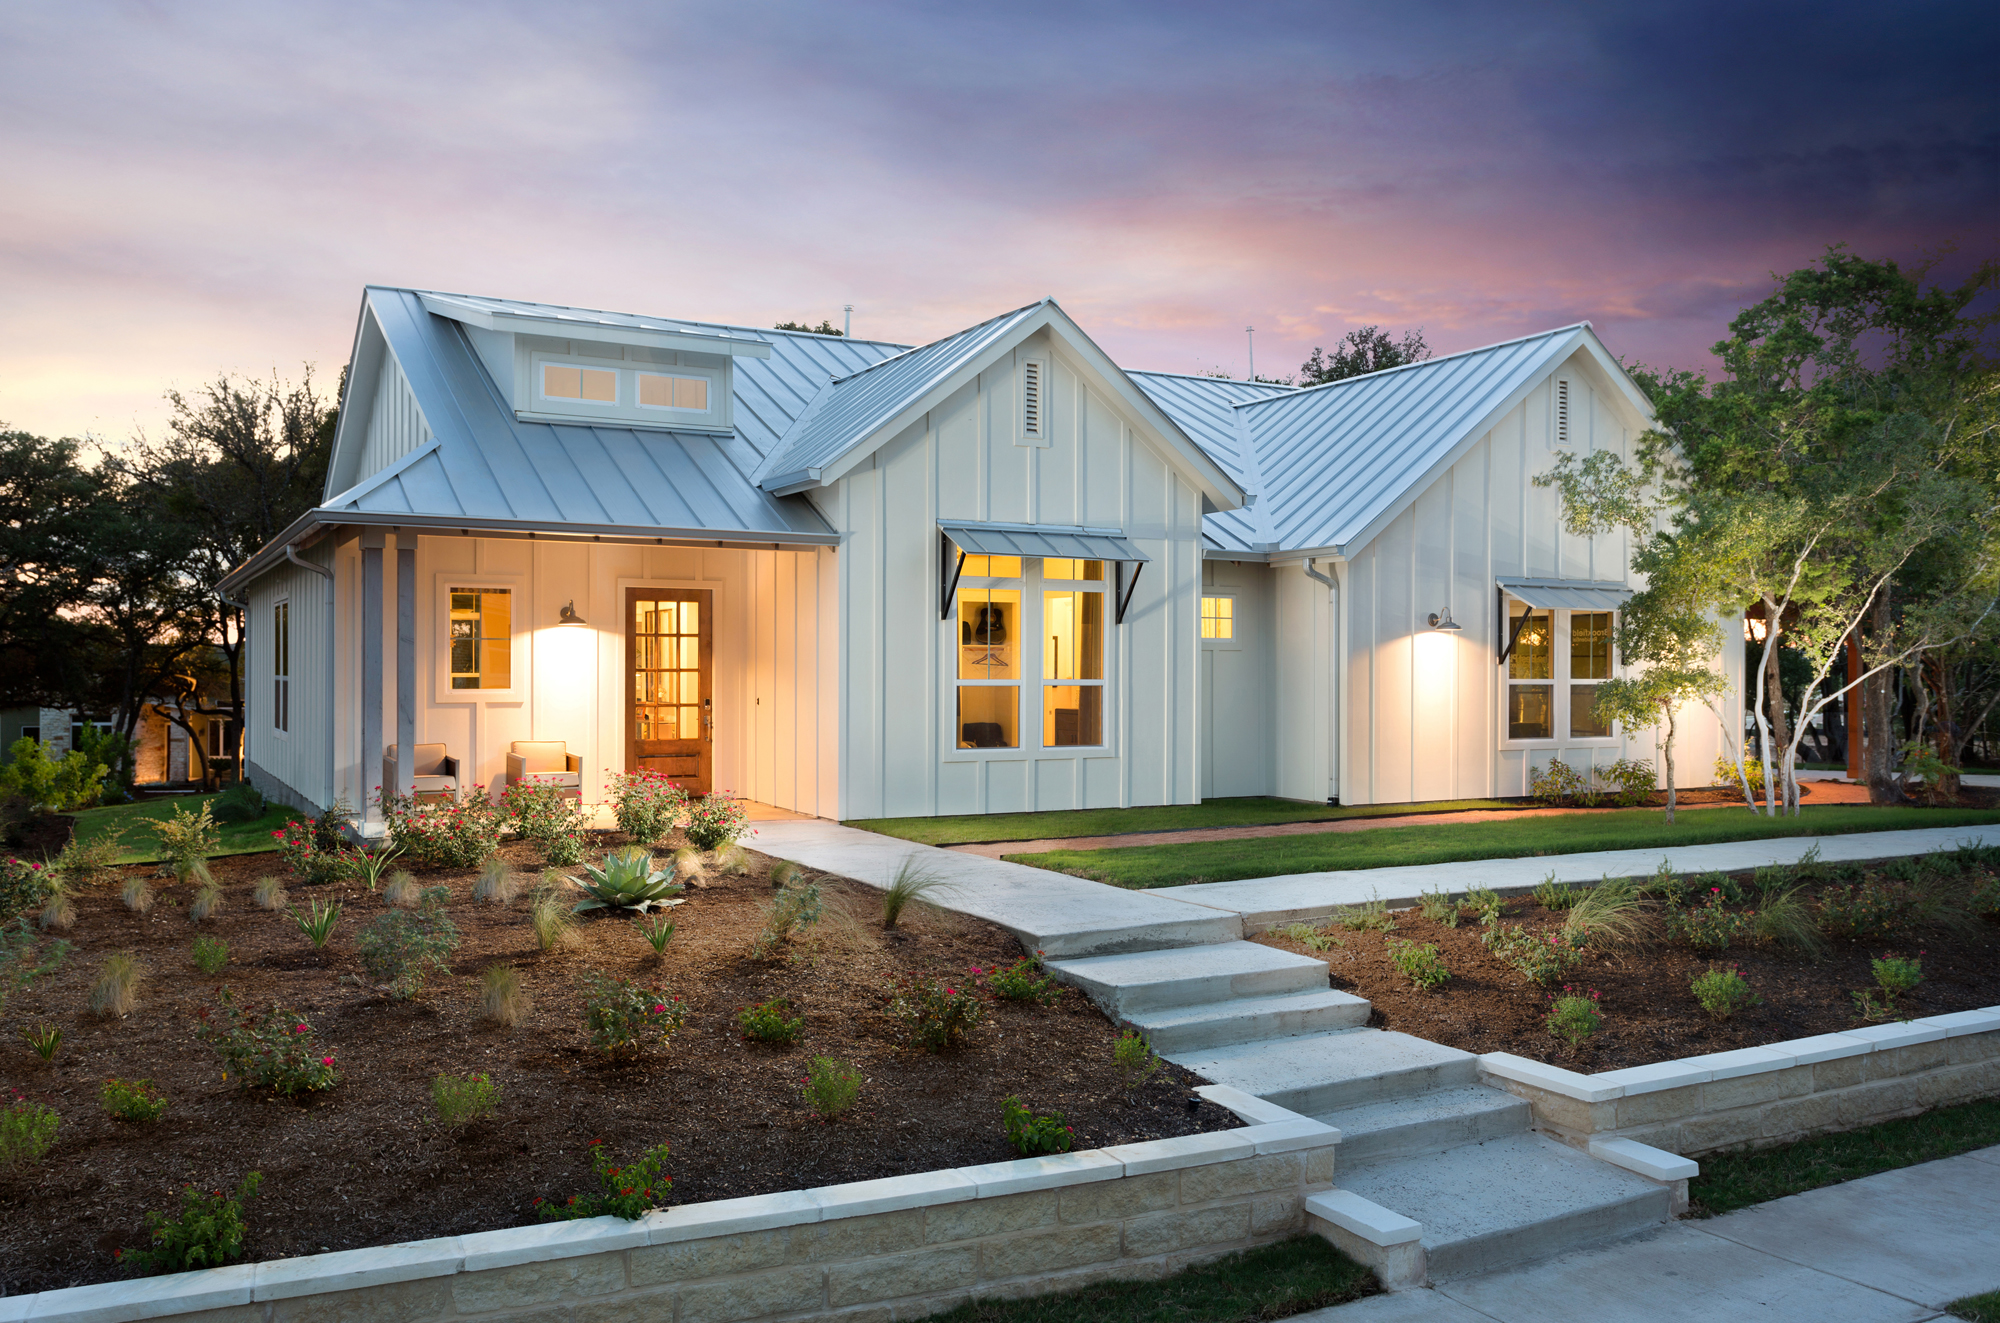 architectural-photographer-austin-texas.jpg